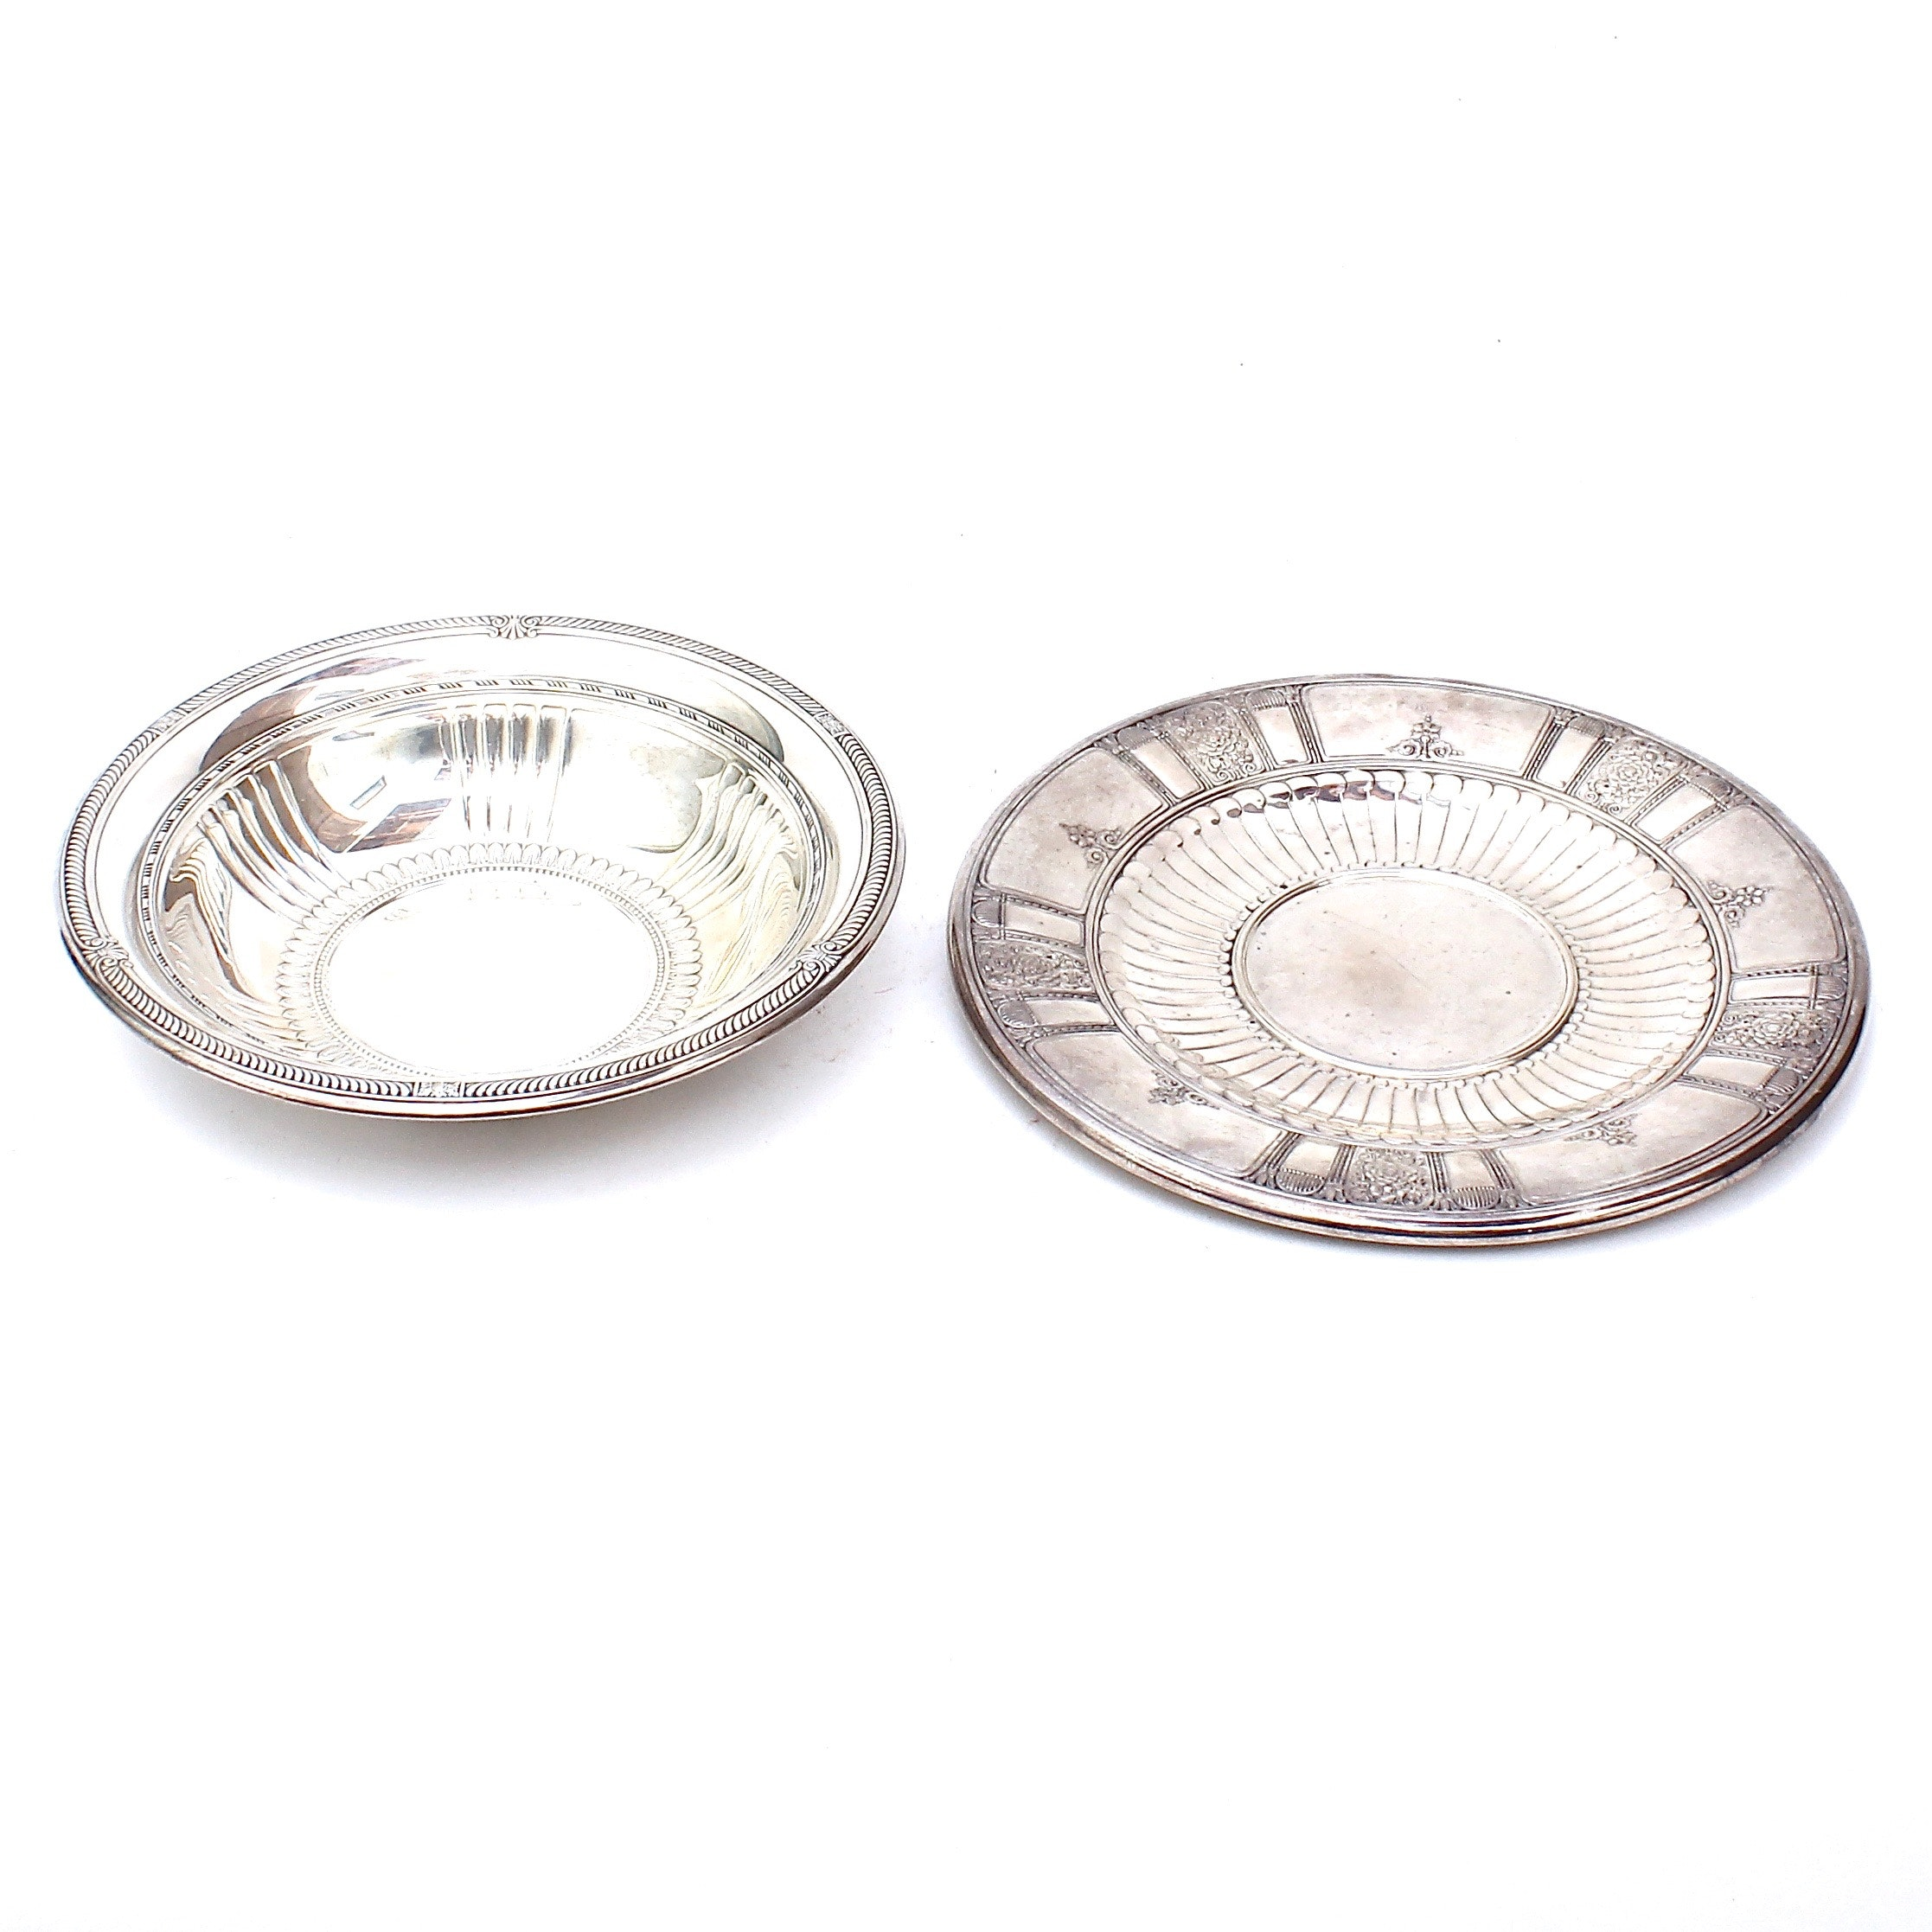 Vintage Gorham Sterling Silver Tableware